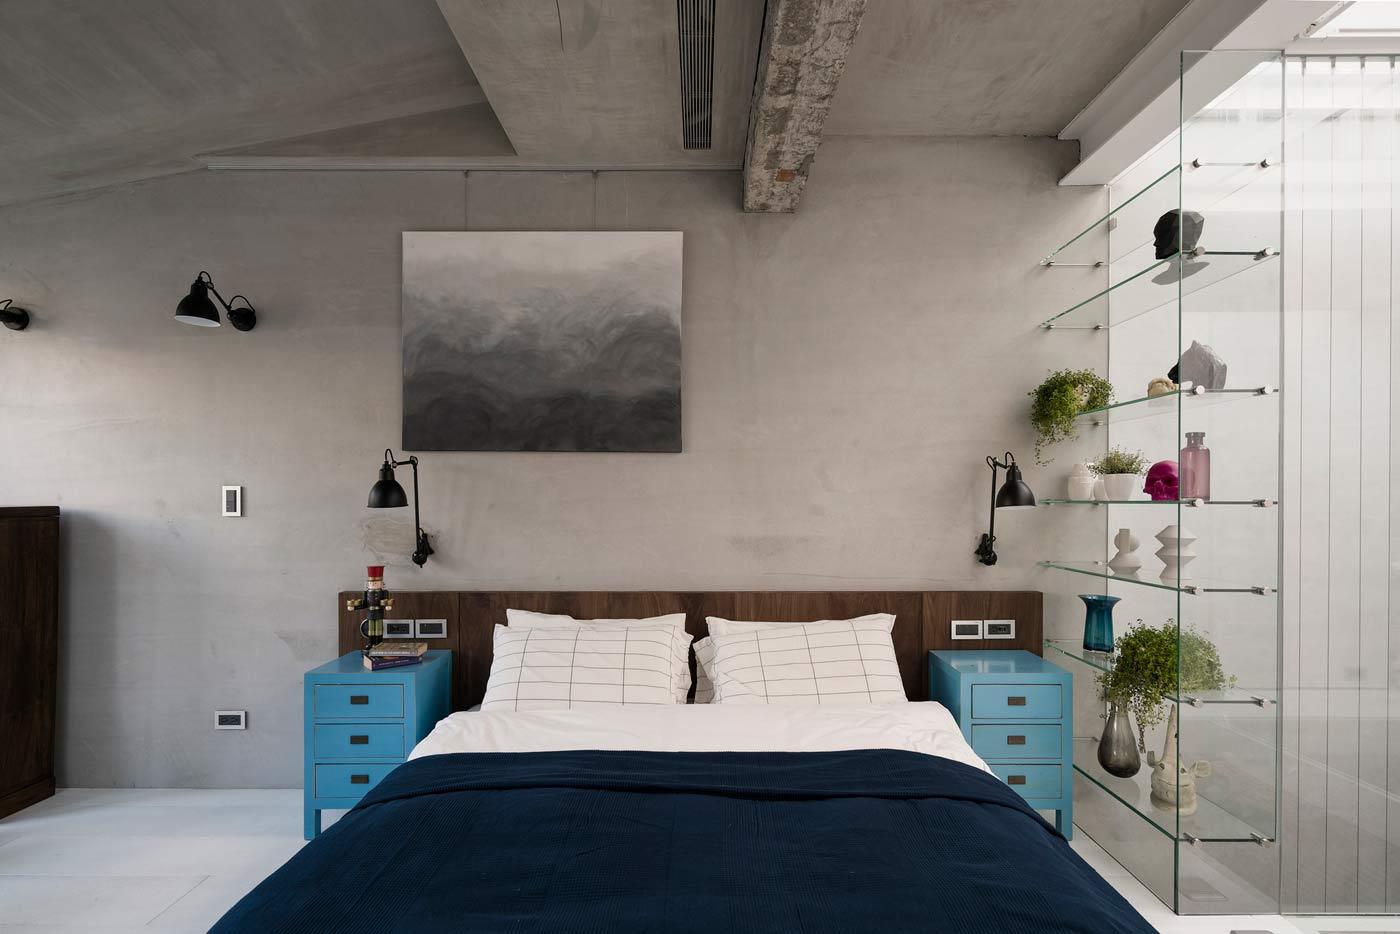 house-w-k-c-design-studio-5